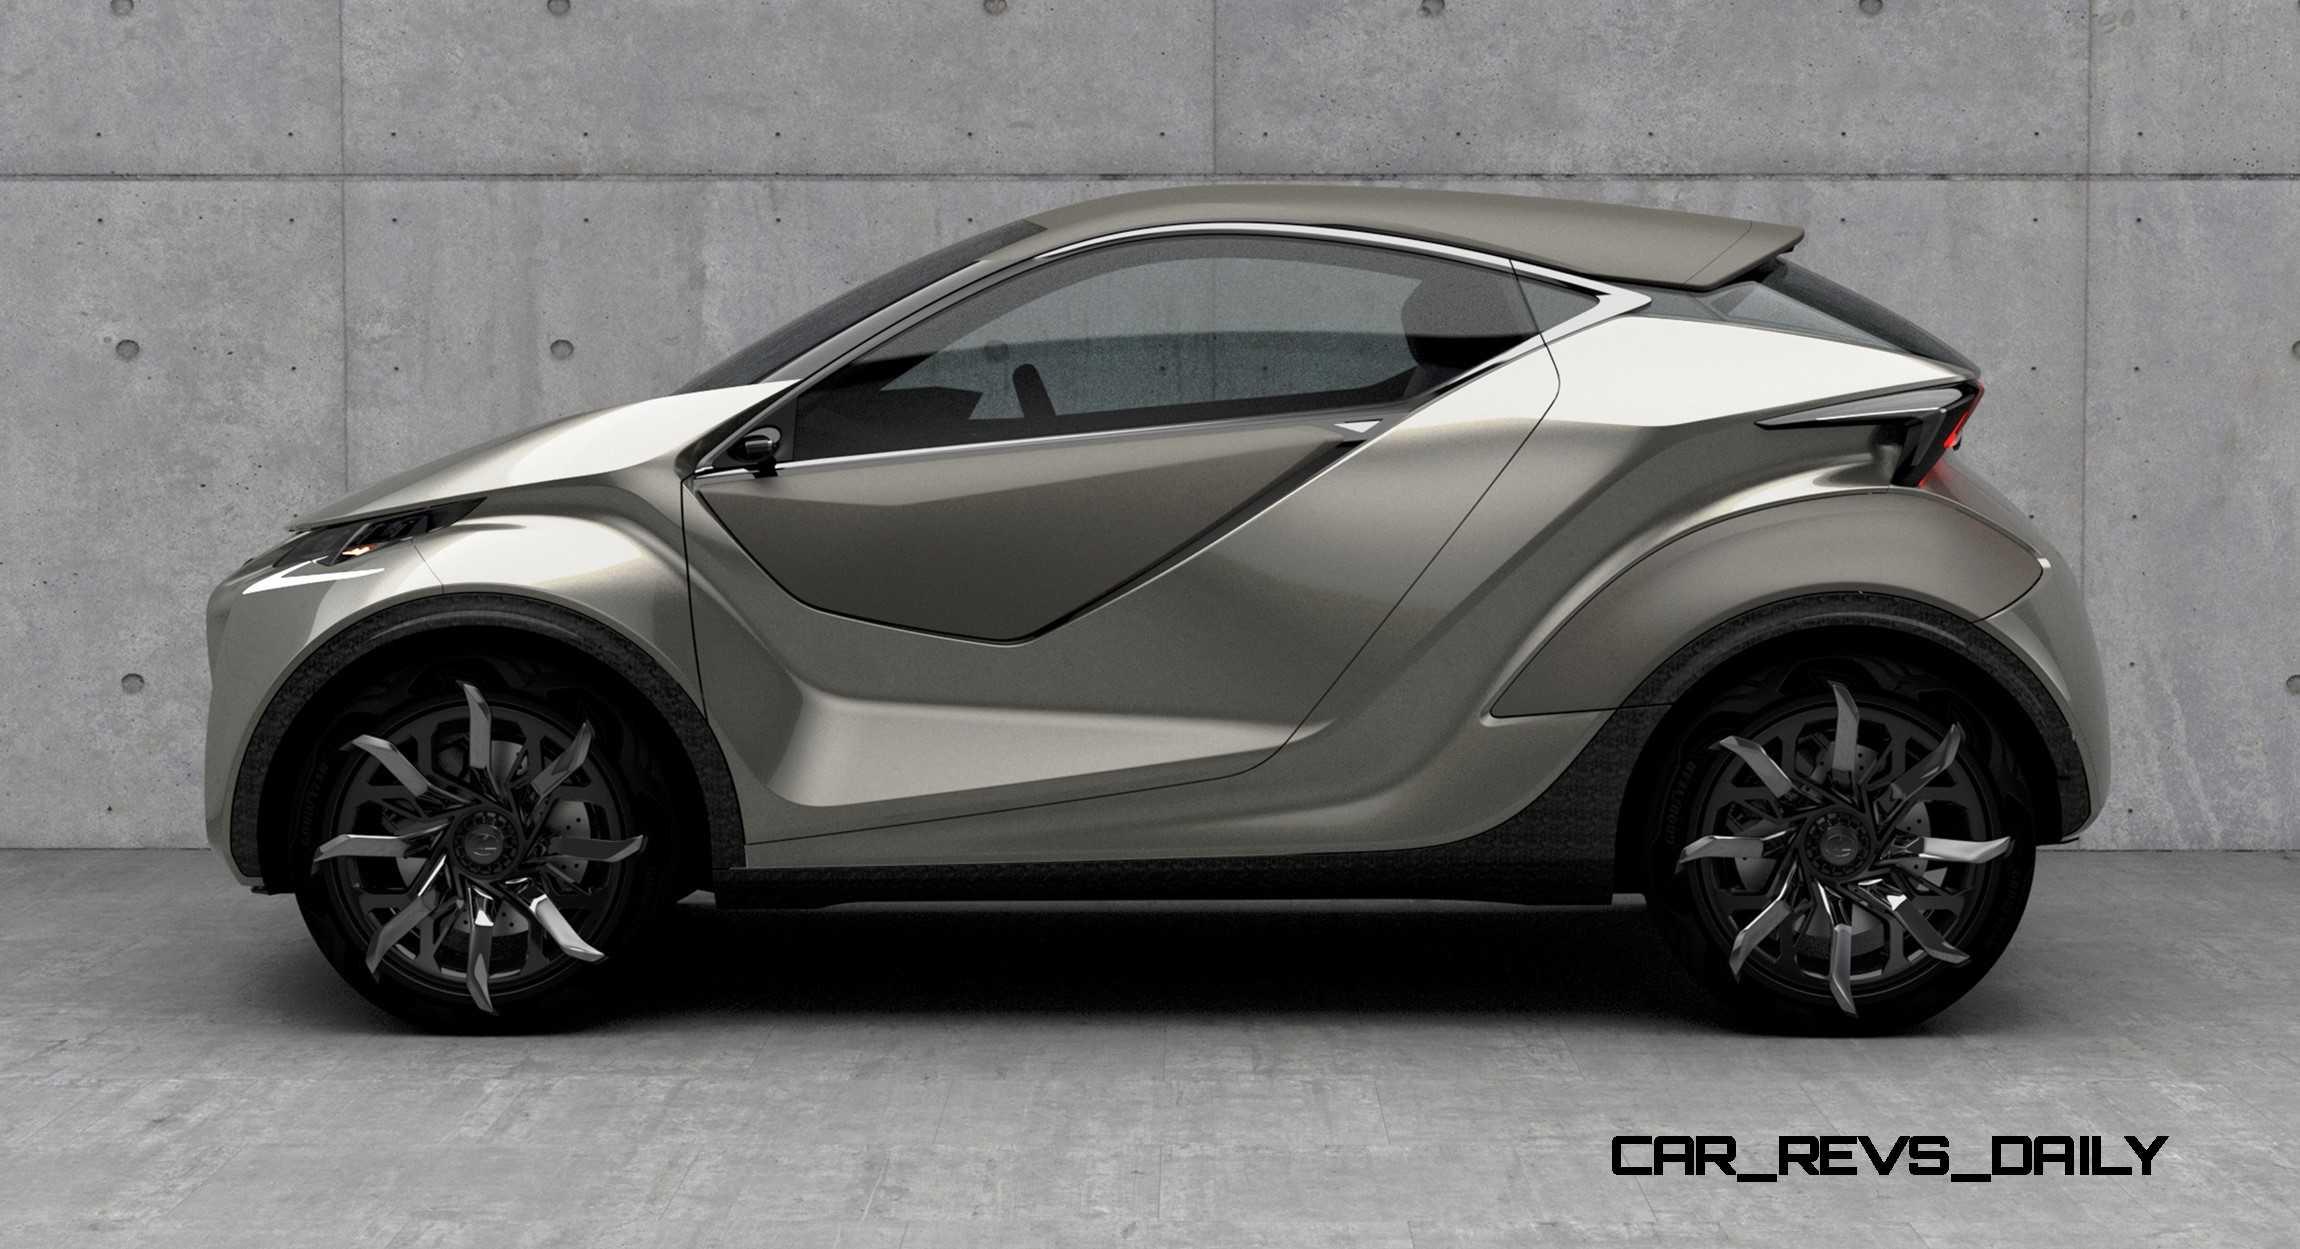 http://www.car-revs-daily.com/wp-content/uploads/2015/03/2015-Lexus-LF-SA-Concept-18.jpg